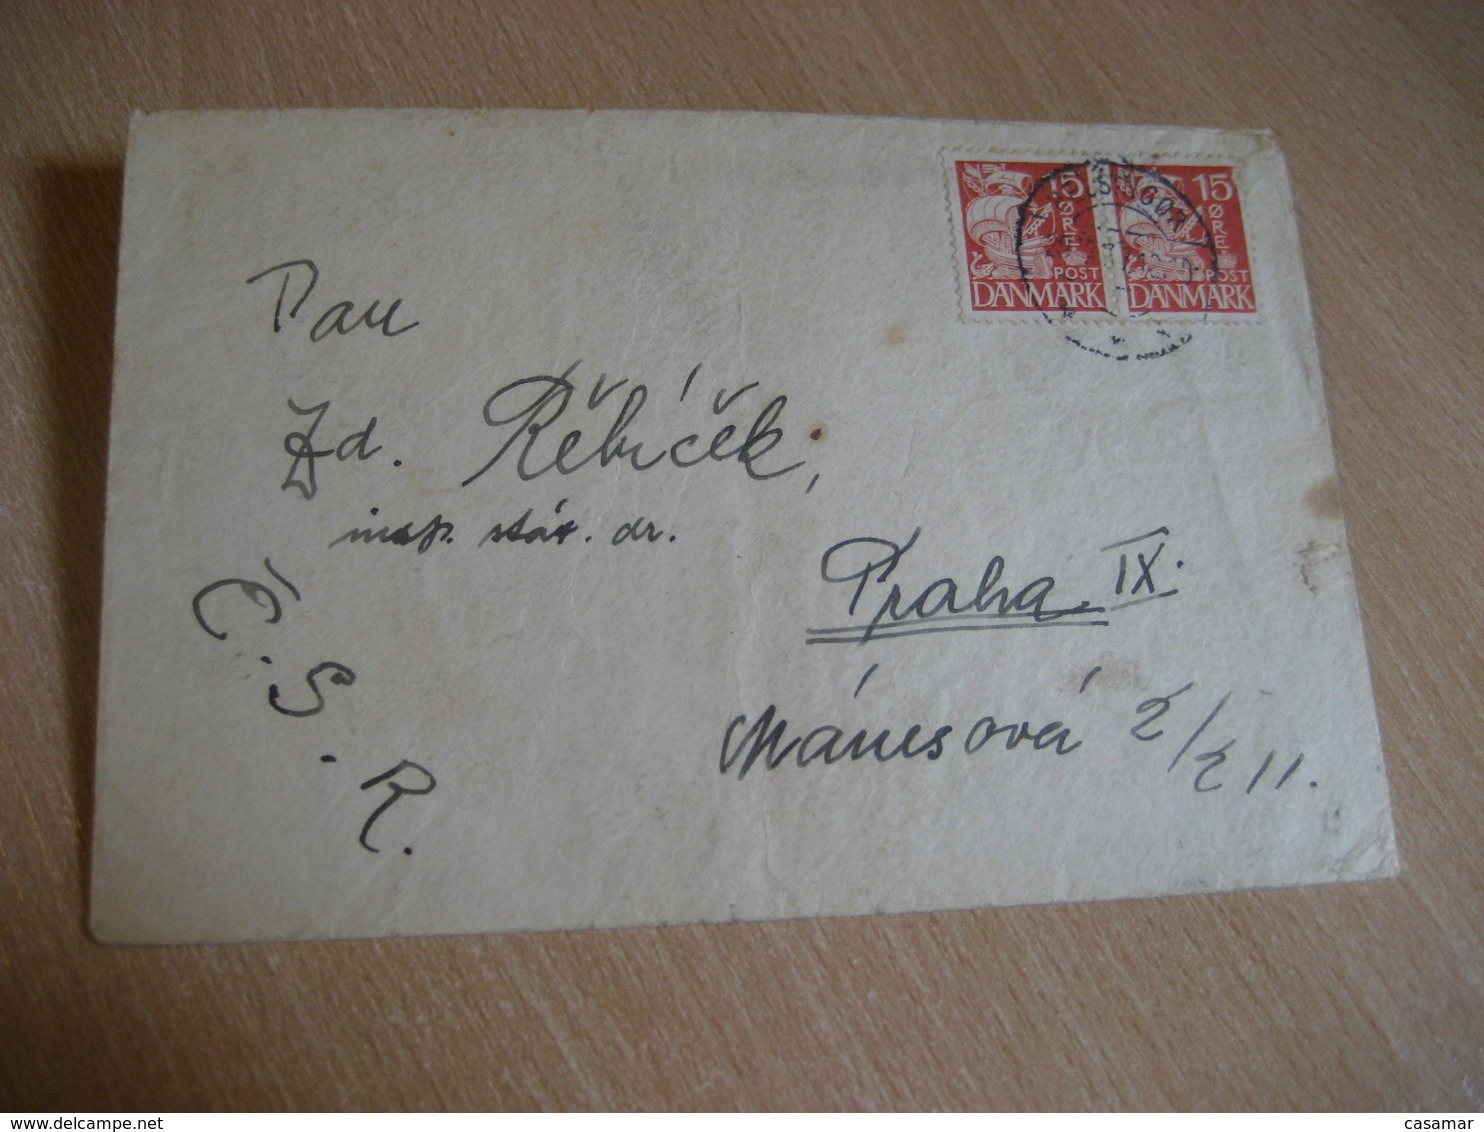 HELSINGOR 1937 ? To Praga Czechoslovakia Pair 2 Stamp On Cancel Cover DENMARK - 1913-47 (Christian X)